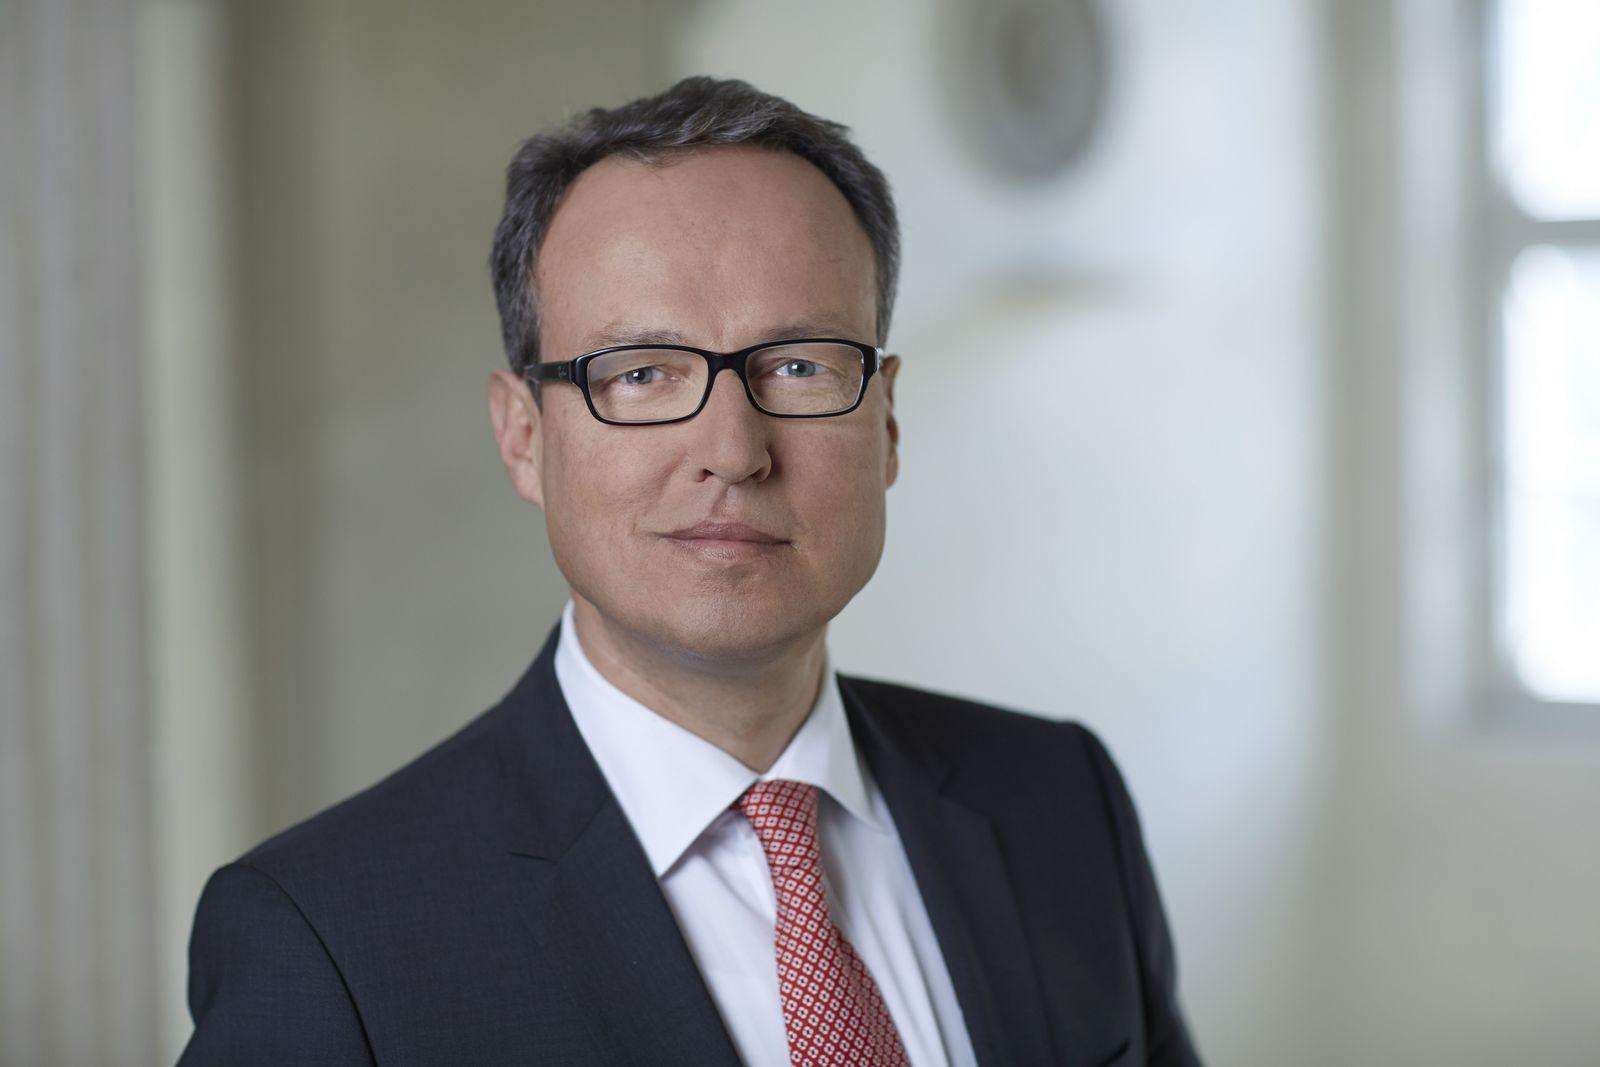 Hinrich J. Woebcken